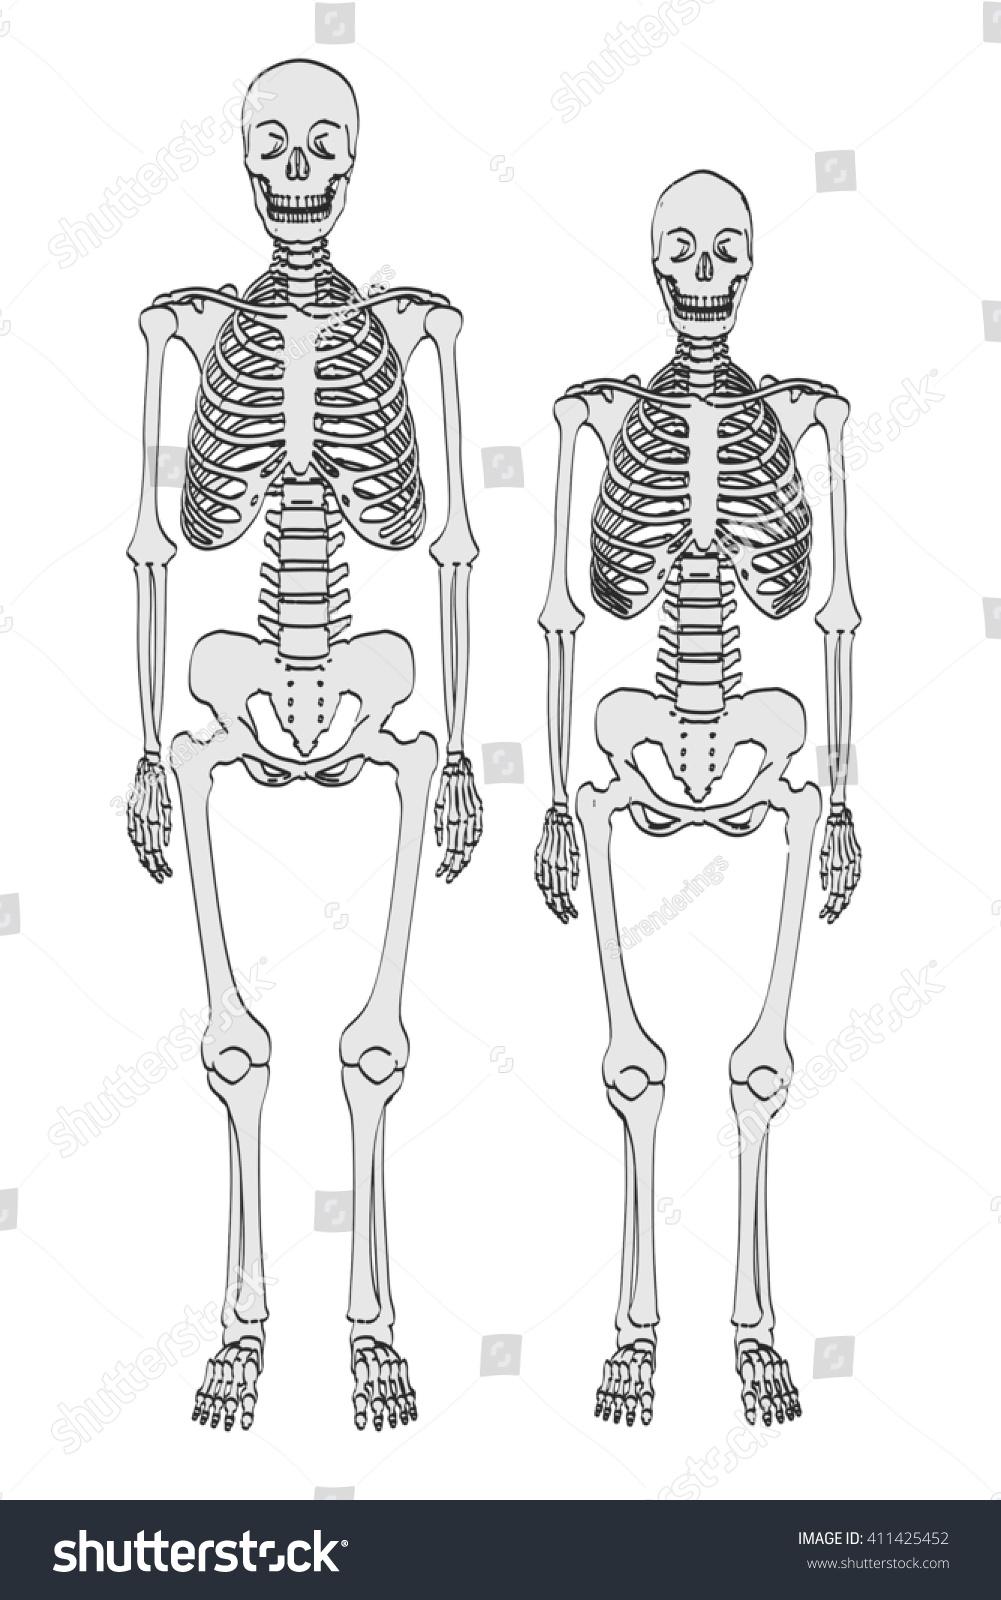 2 D Cartoon Illustration Skeletons Male Female Stock Illustration ...